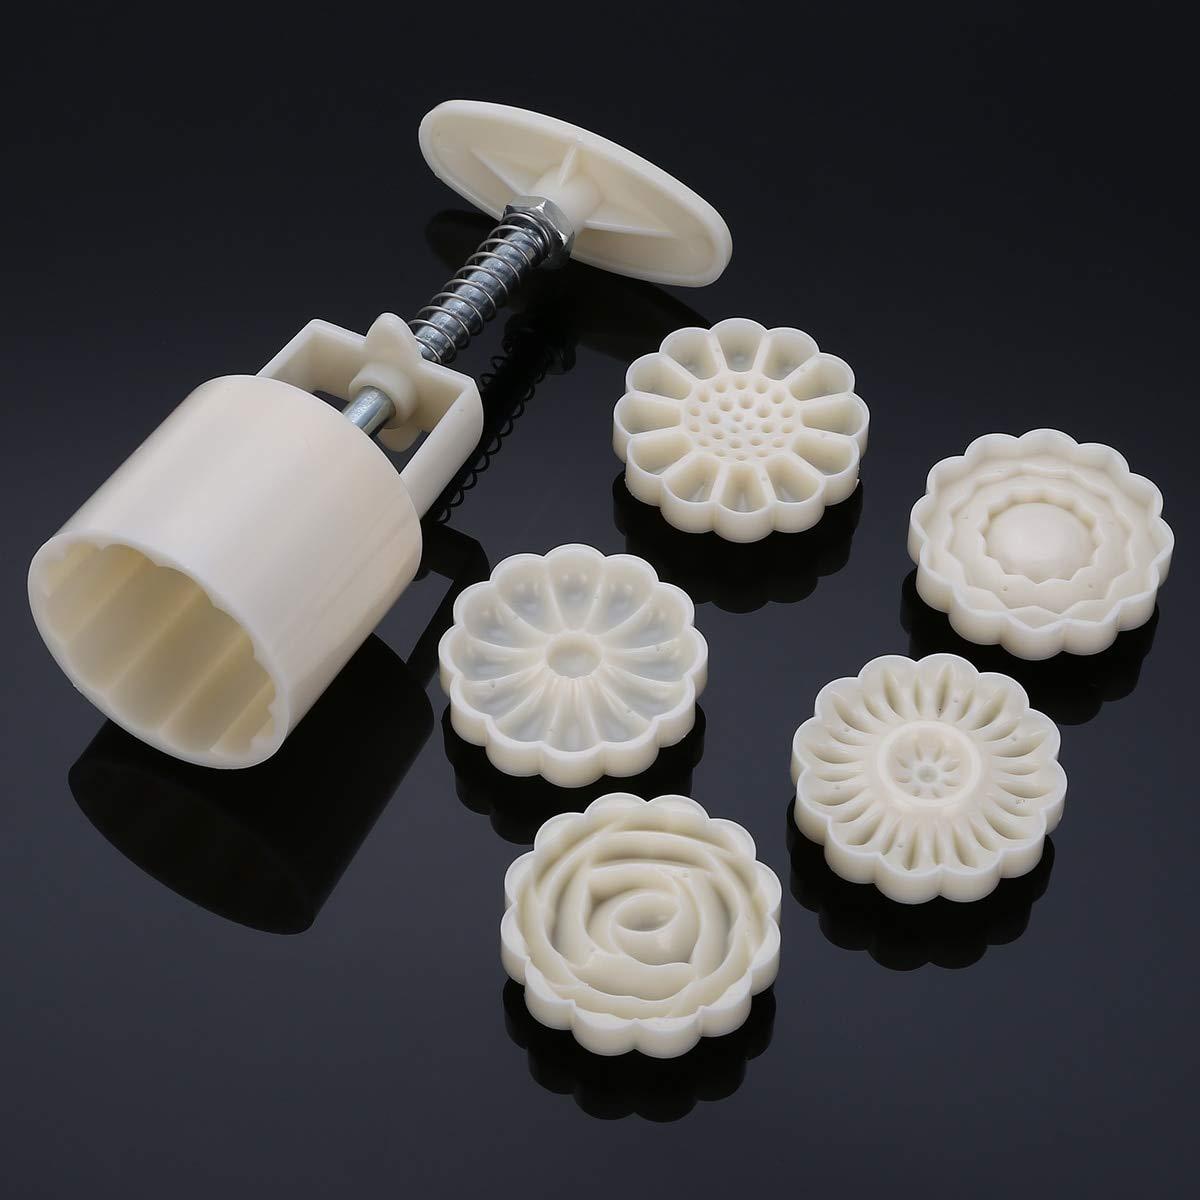 MultiBox 3D Rose Flower Mooncake Mold Mid-Autumn Festival Hand Pressure Mould DIY Tool Cookie Cutter Cake Bakeware1 Barrel +6 Stamps Set